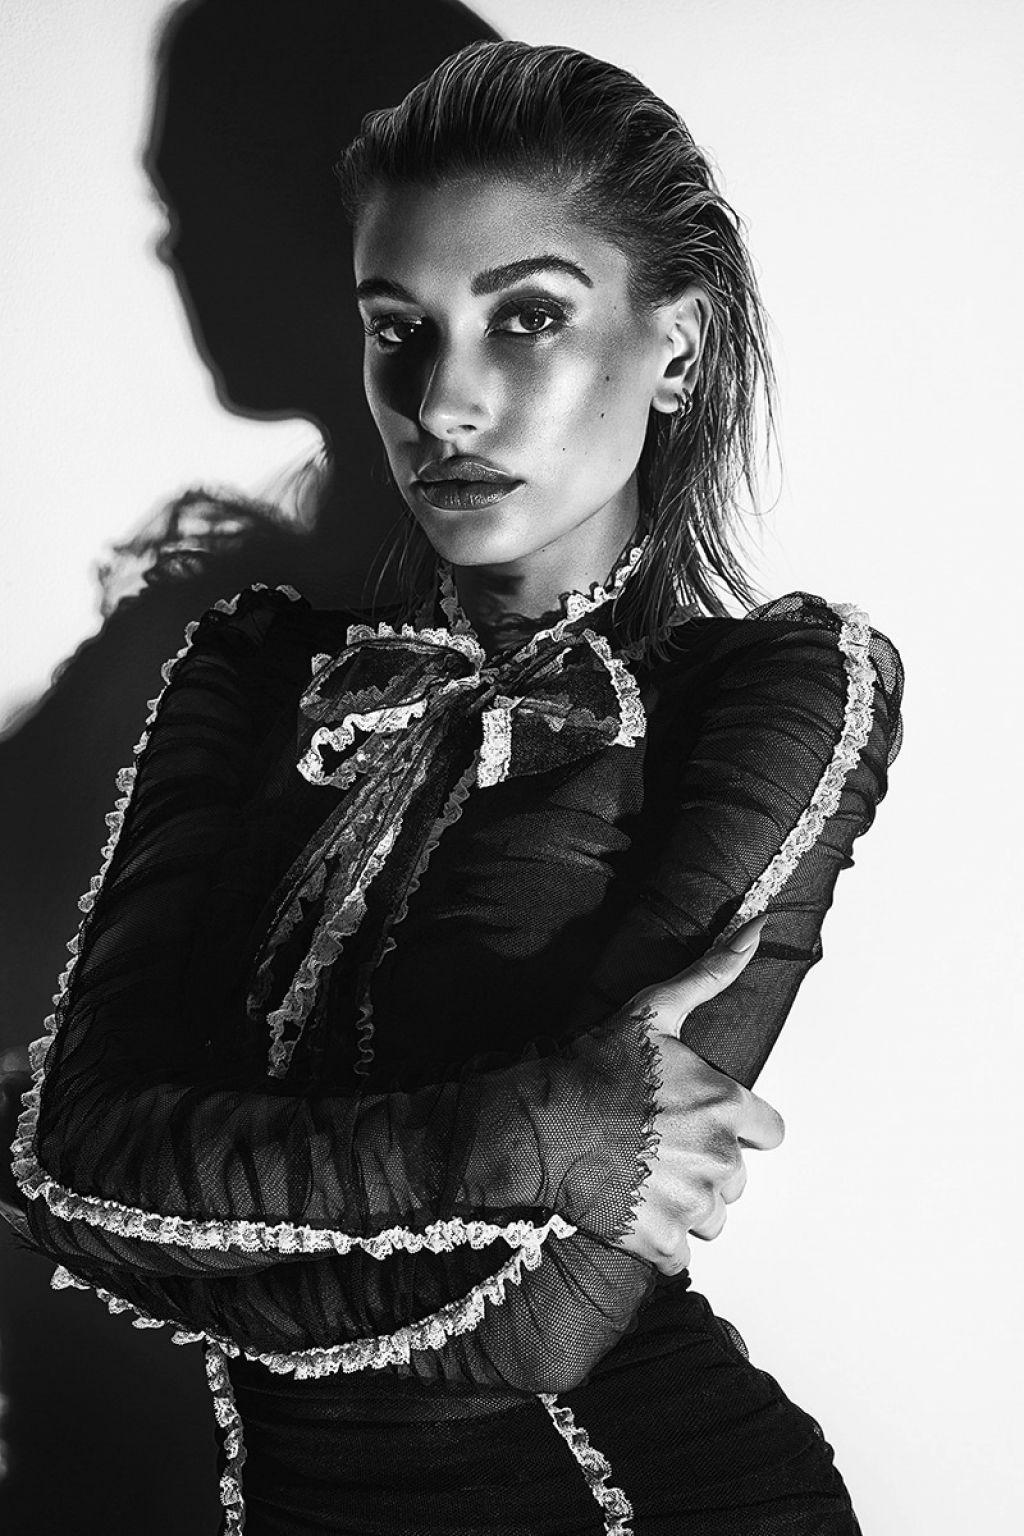 Communication on this topic: Isabeli fontana 2019, hailey-baldwin-fashion-magazine-october-2019-issue/